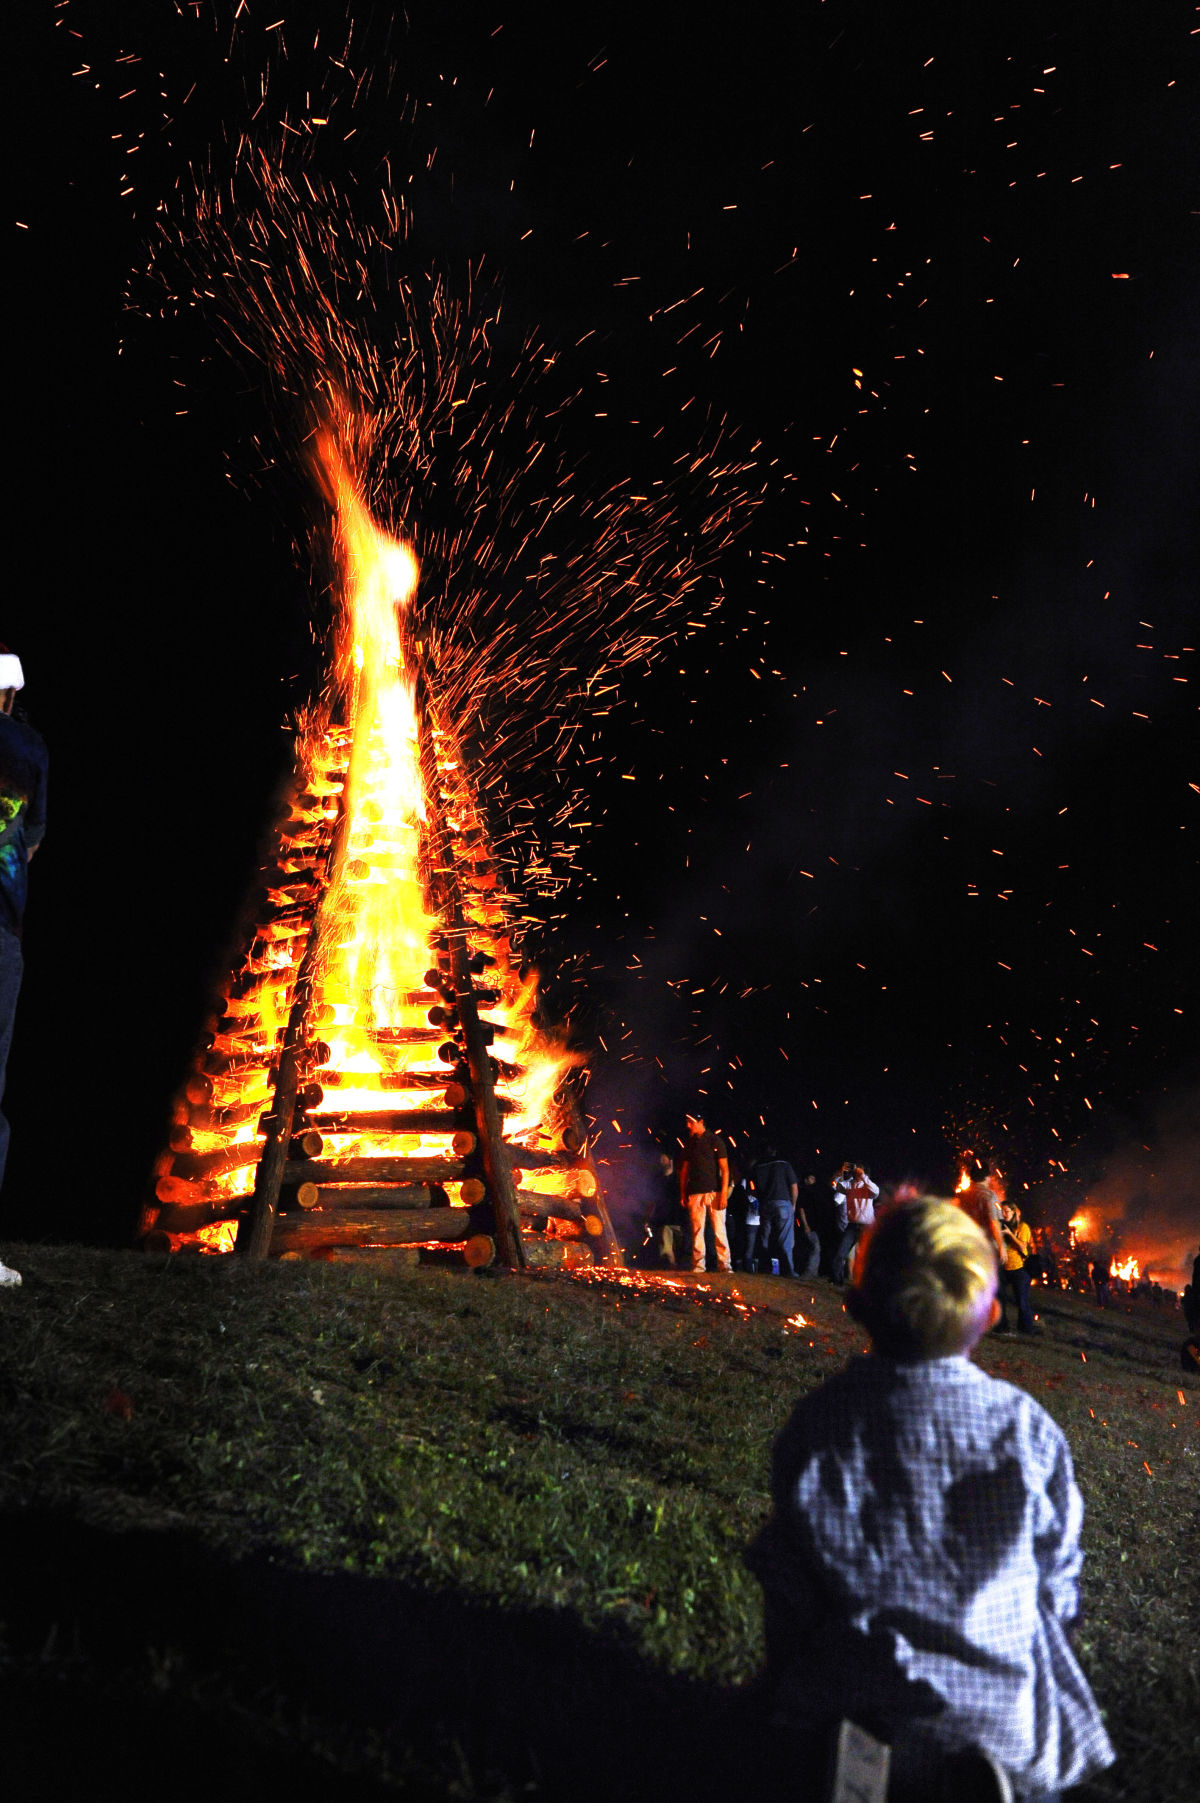 Christmas Eve Bonfires On The Levee 2020 Christmas Eve Bonfires on the Levee